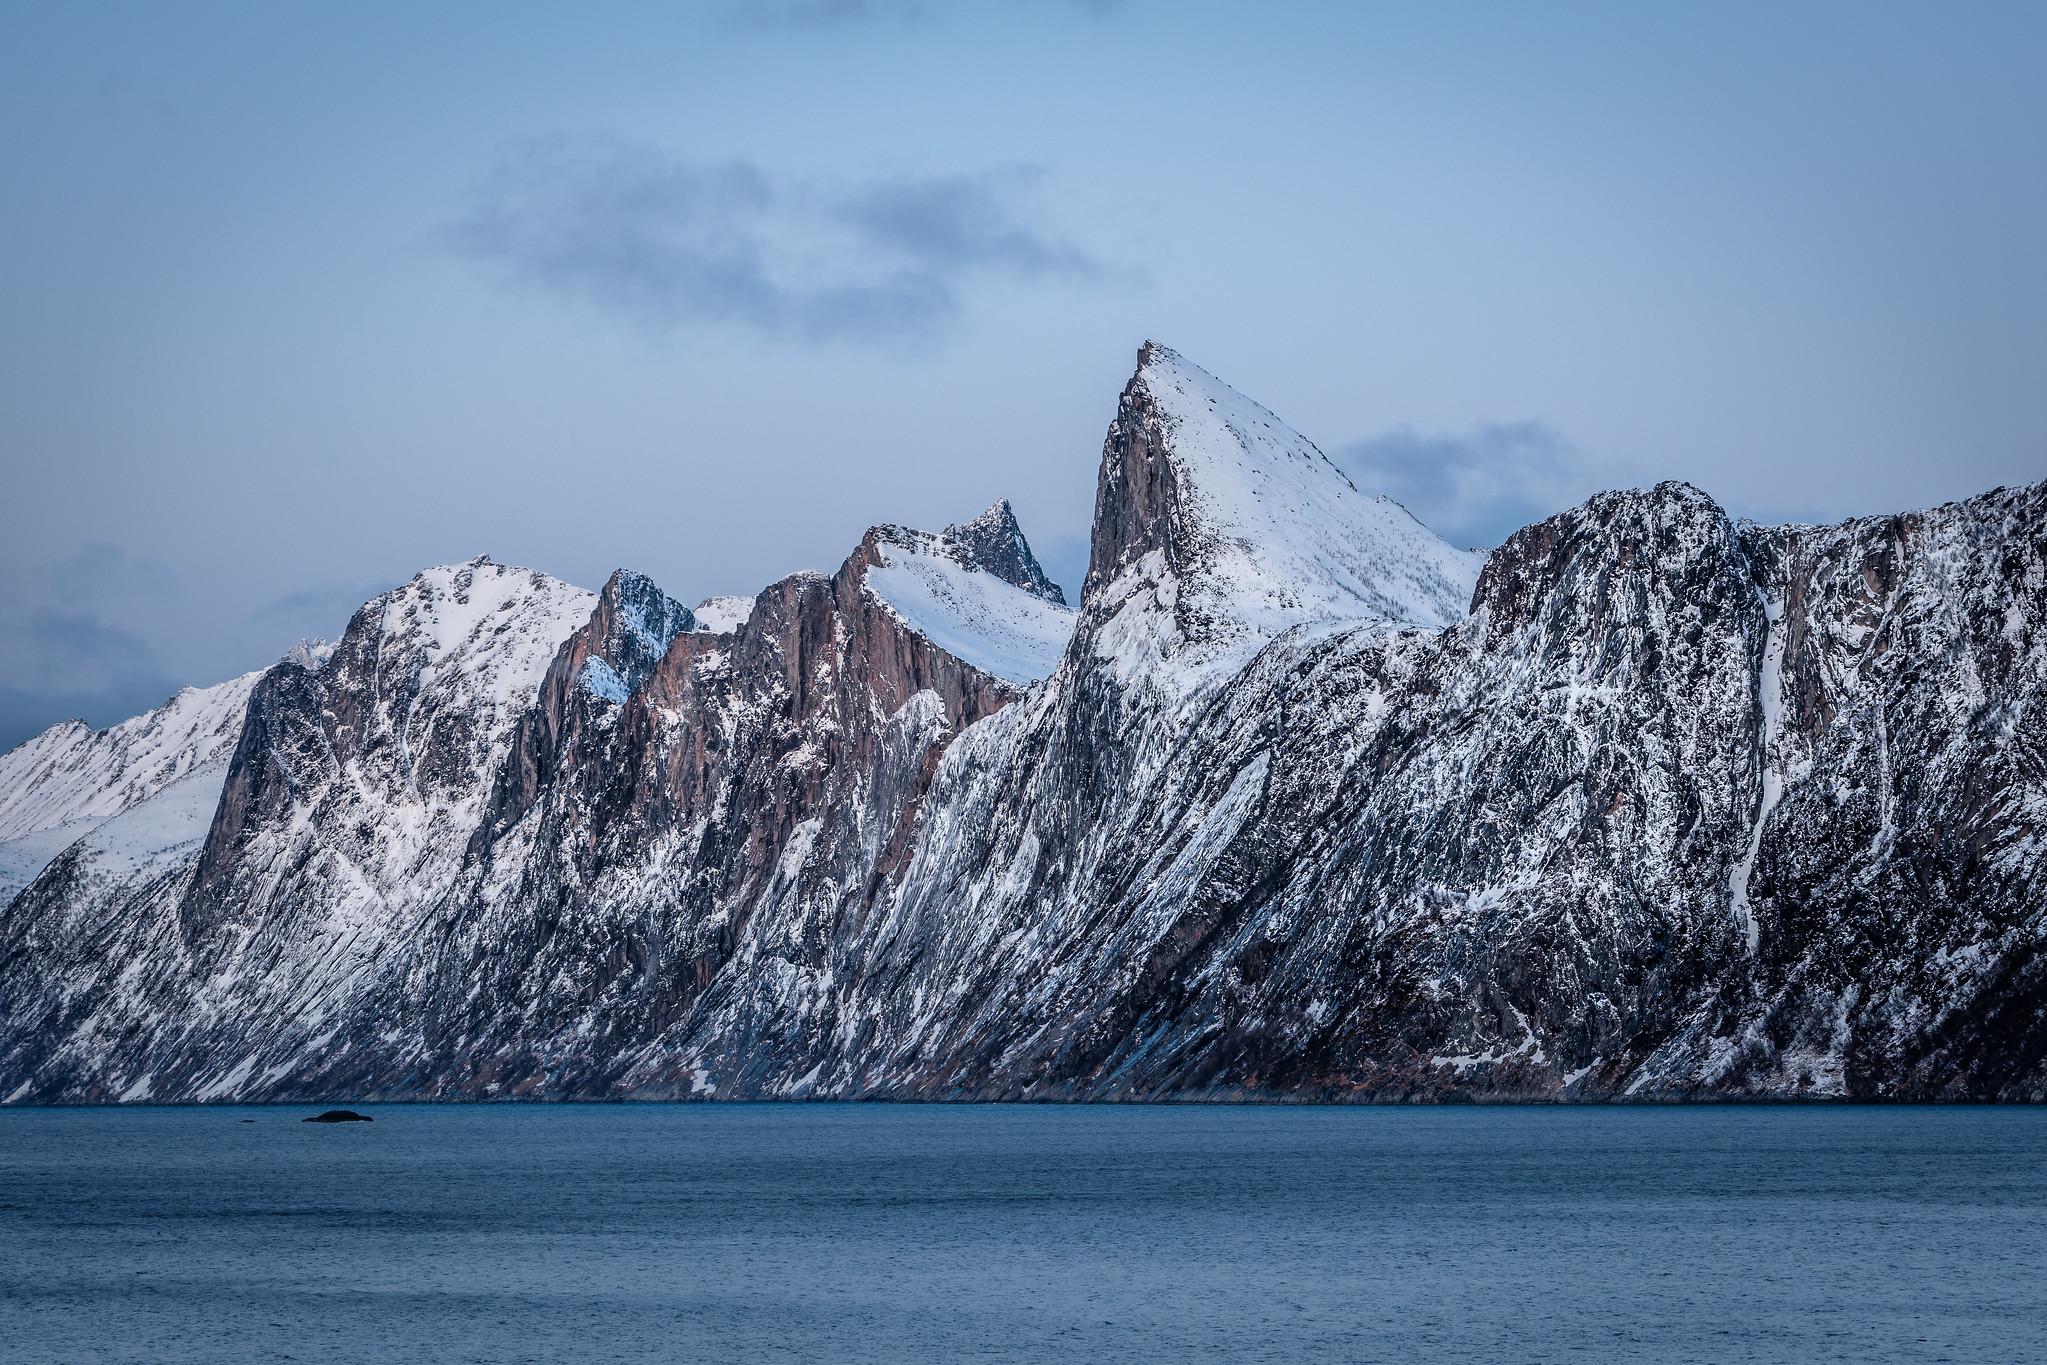 Die Kante der Segla - 600 Meter nahezu senkrecht ins Meer